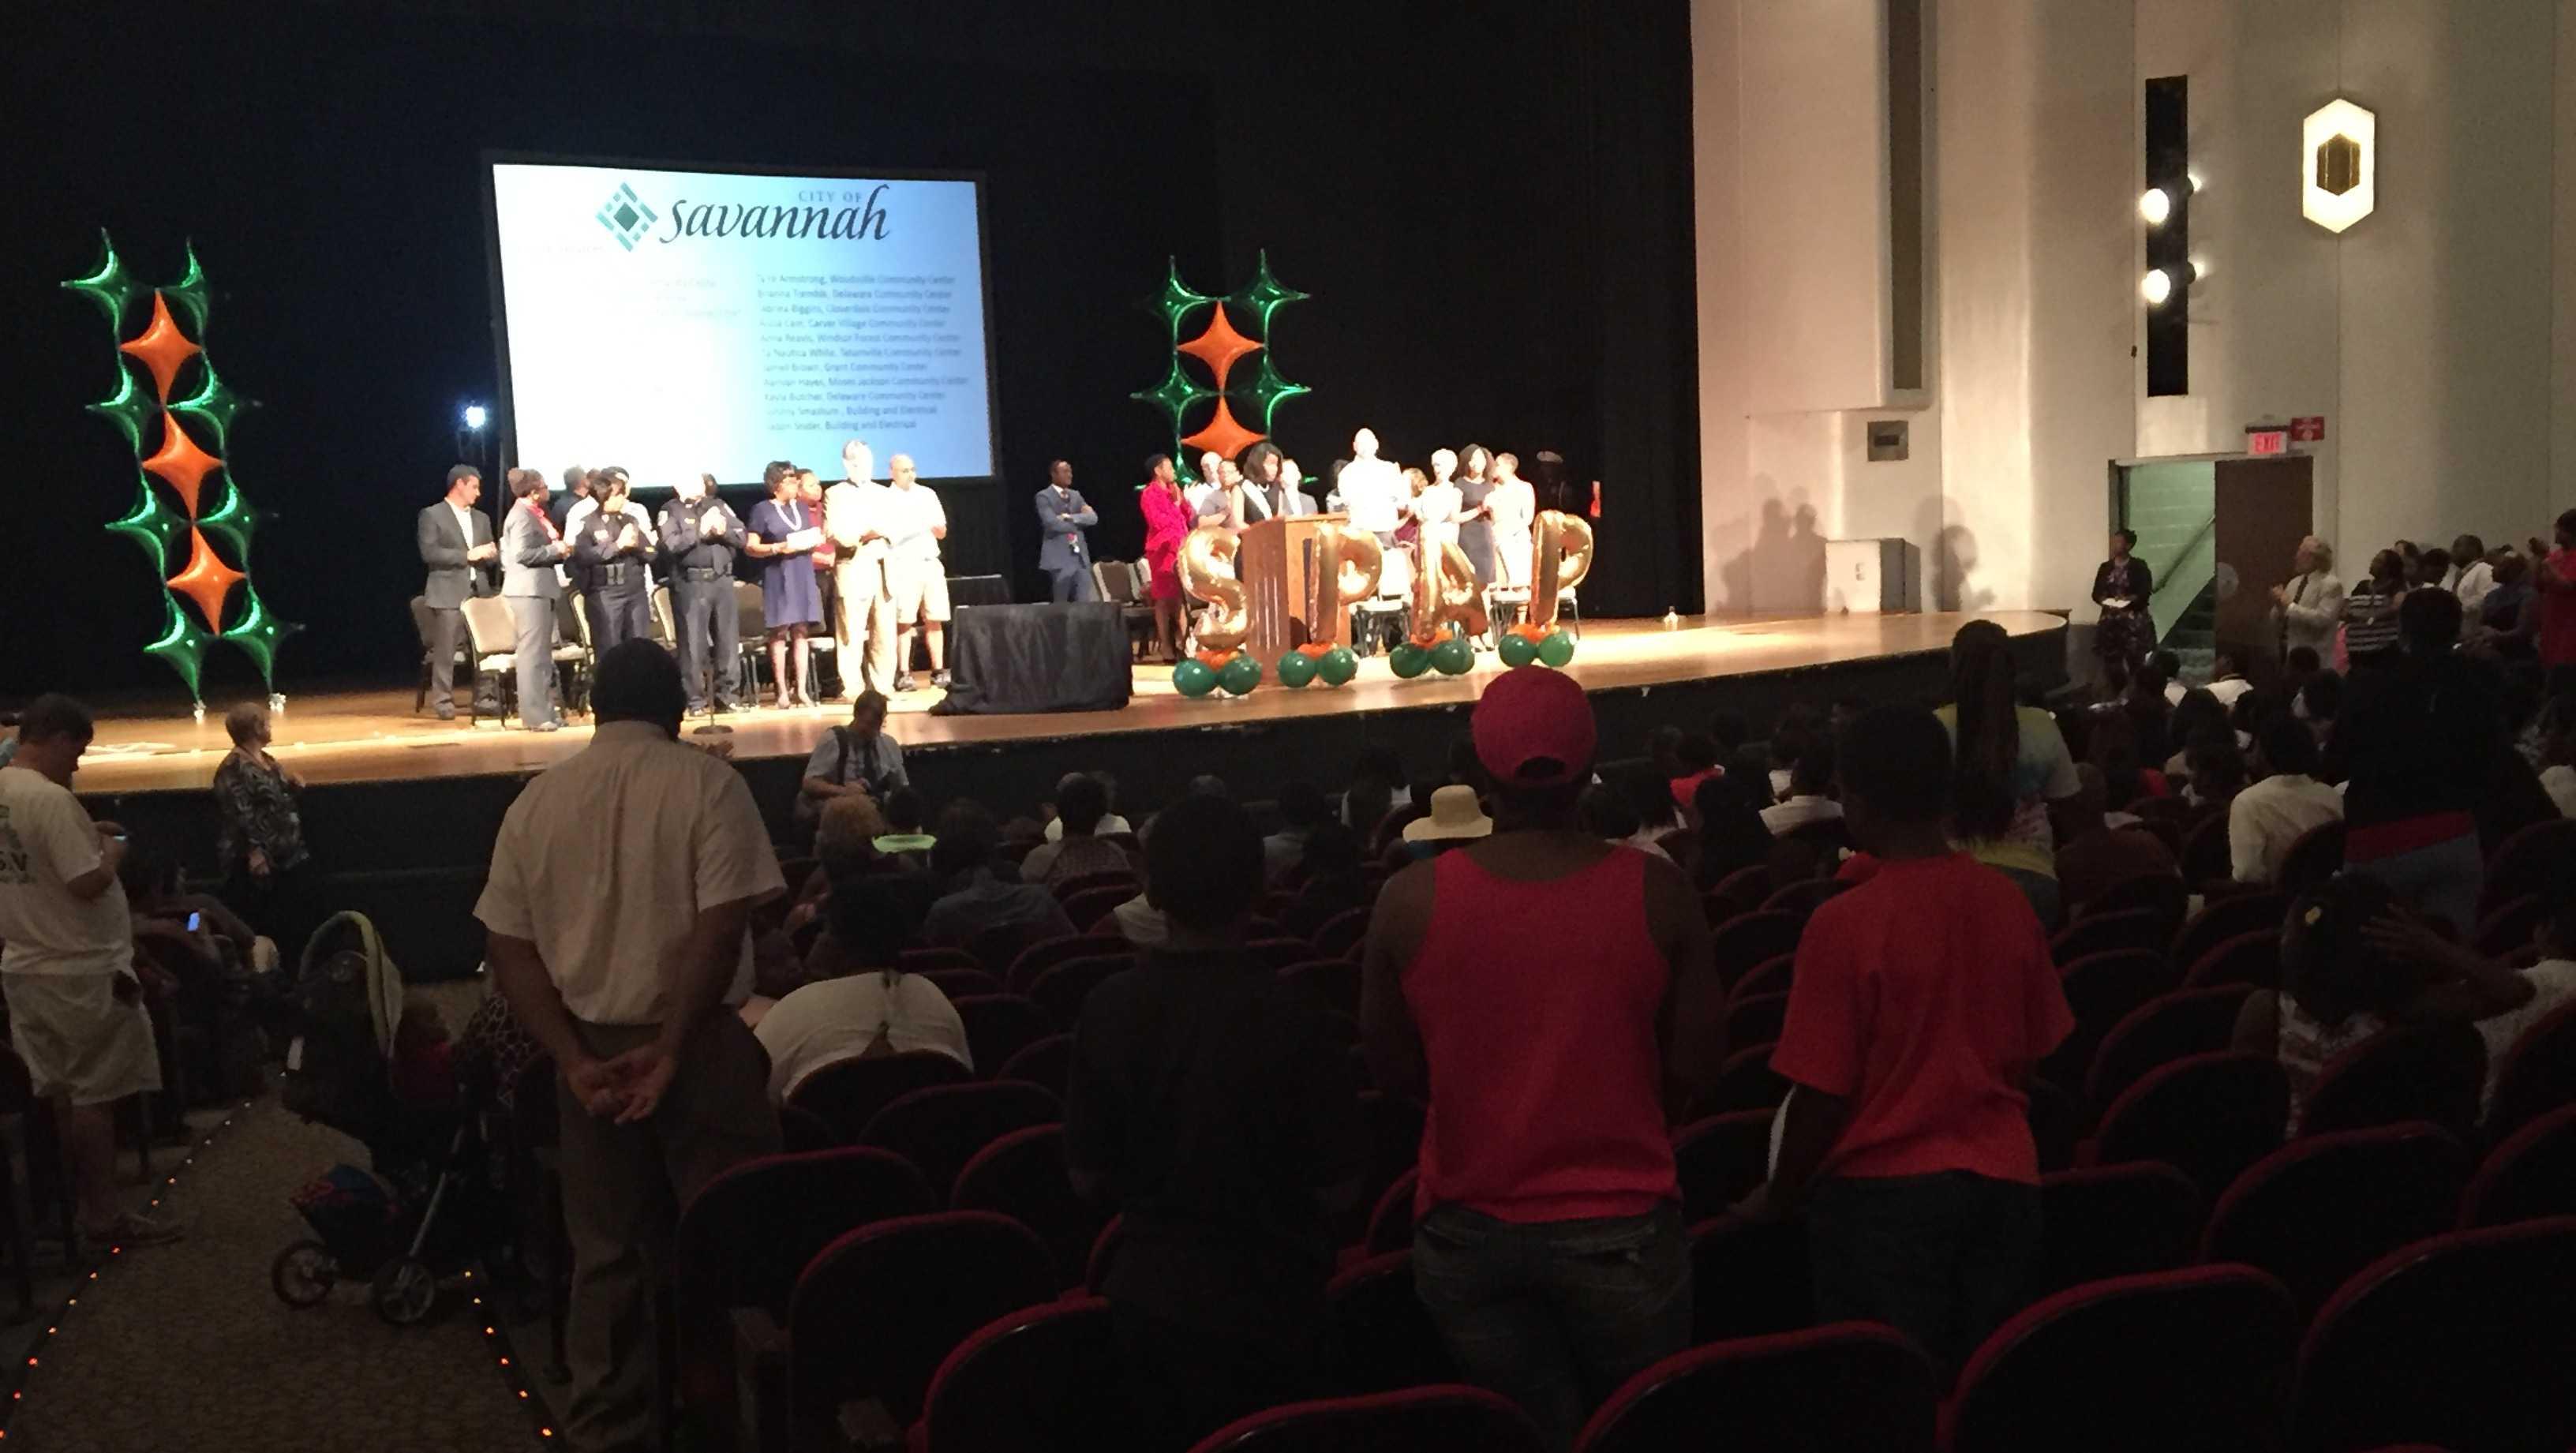 Savannah Pre-Apprentice Program Graduation